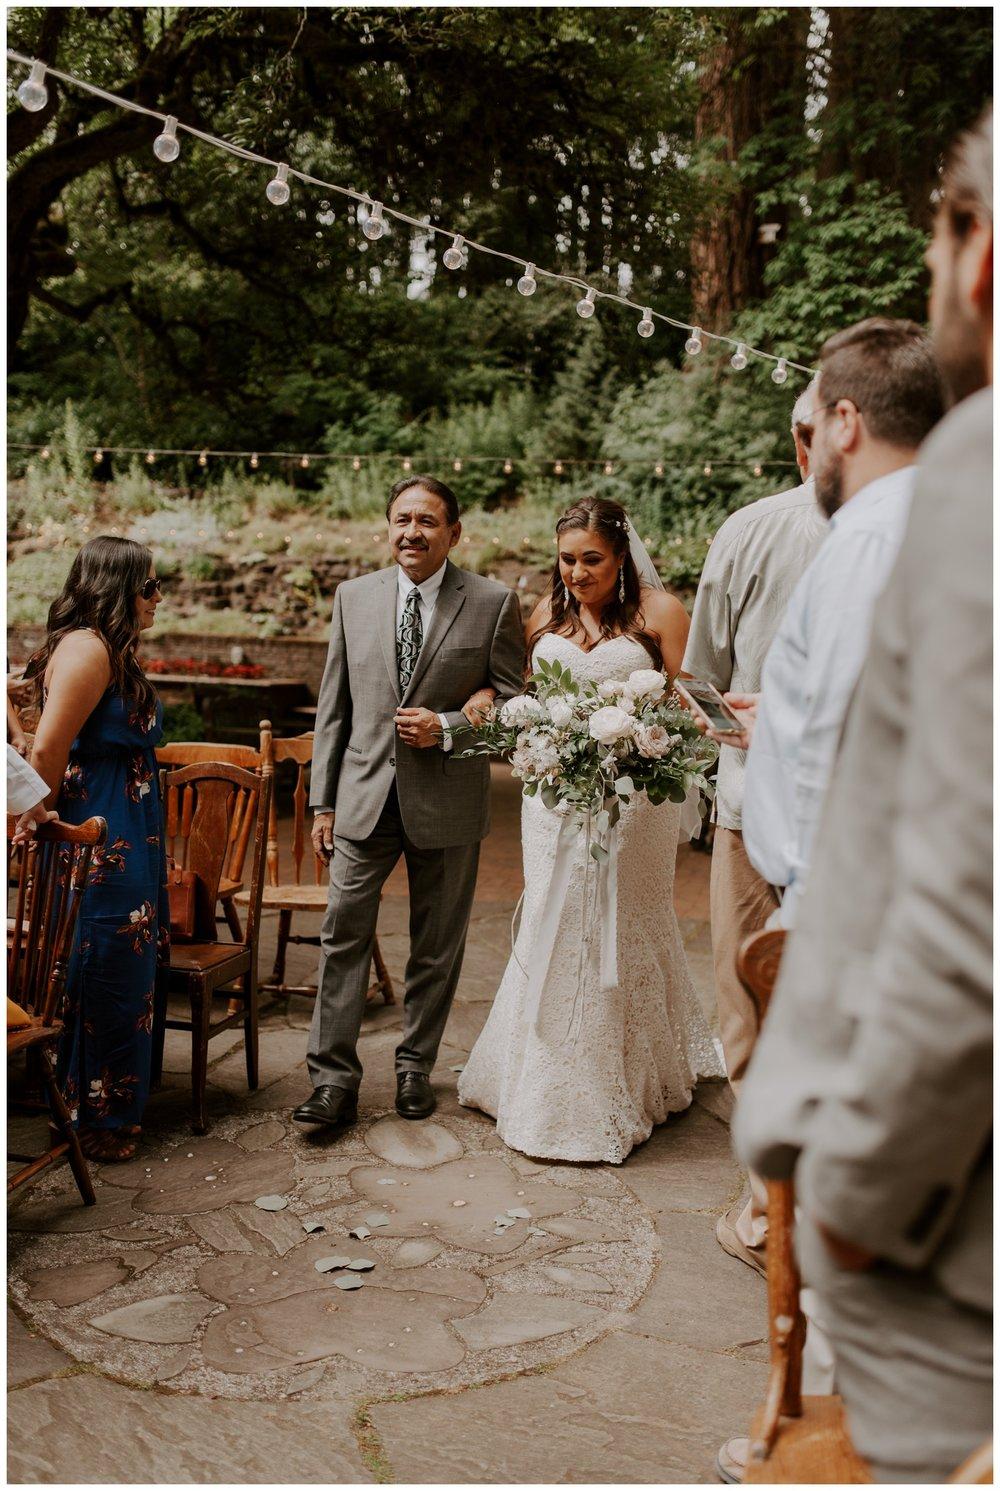 Portland Garden Wedding Jessica Heron Images_0017.jpg